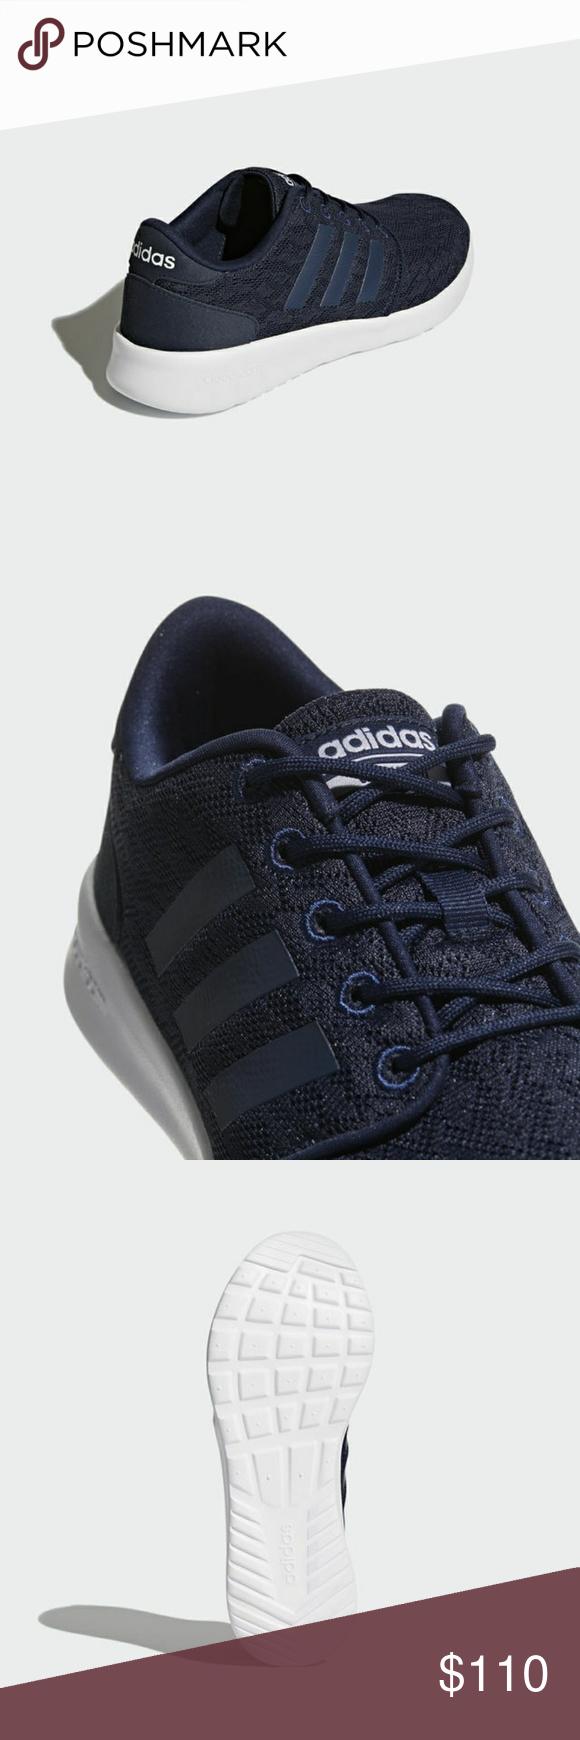 🔸Price Firm🔸 Adidas CLOUDFOAM QT RACER BB9846 CLOUDFOAM QT RACER SHOES  Slim and sleek 188c0096e